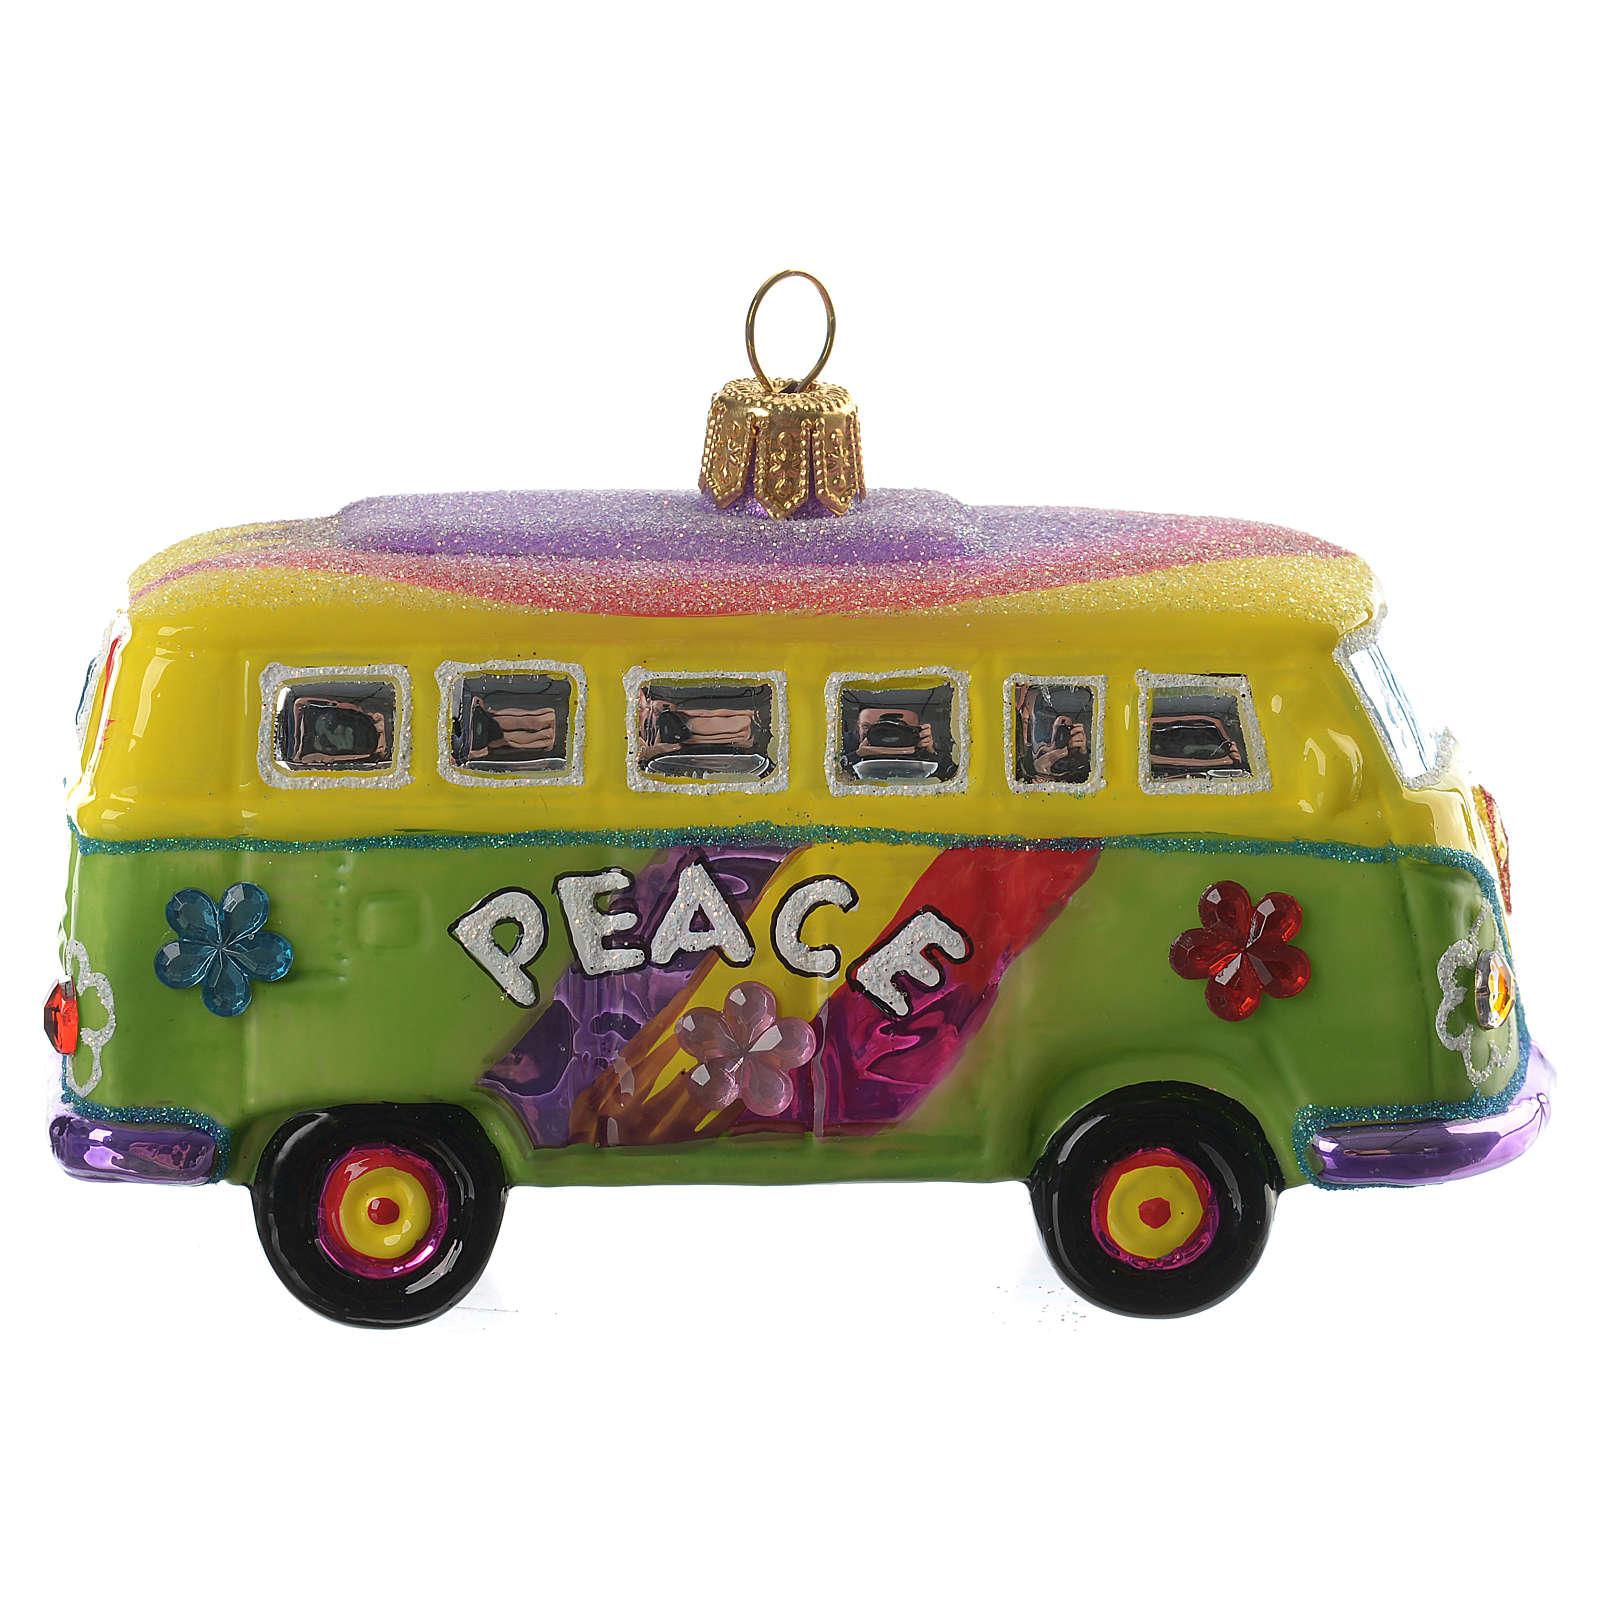 Furgoneta Hippie adorno vidrio soplado para Árbol de Navidad 4